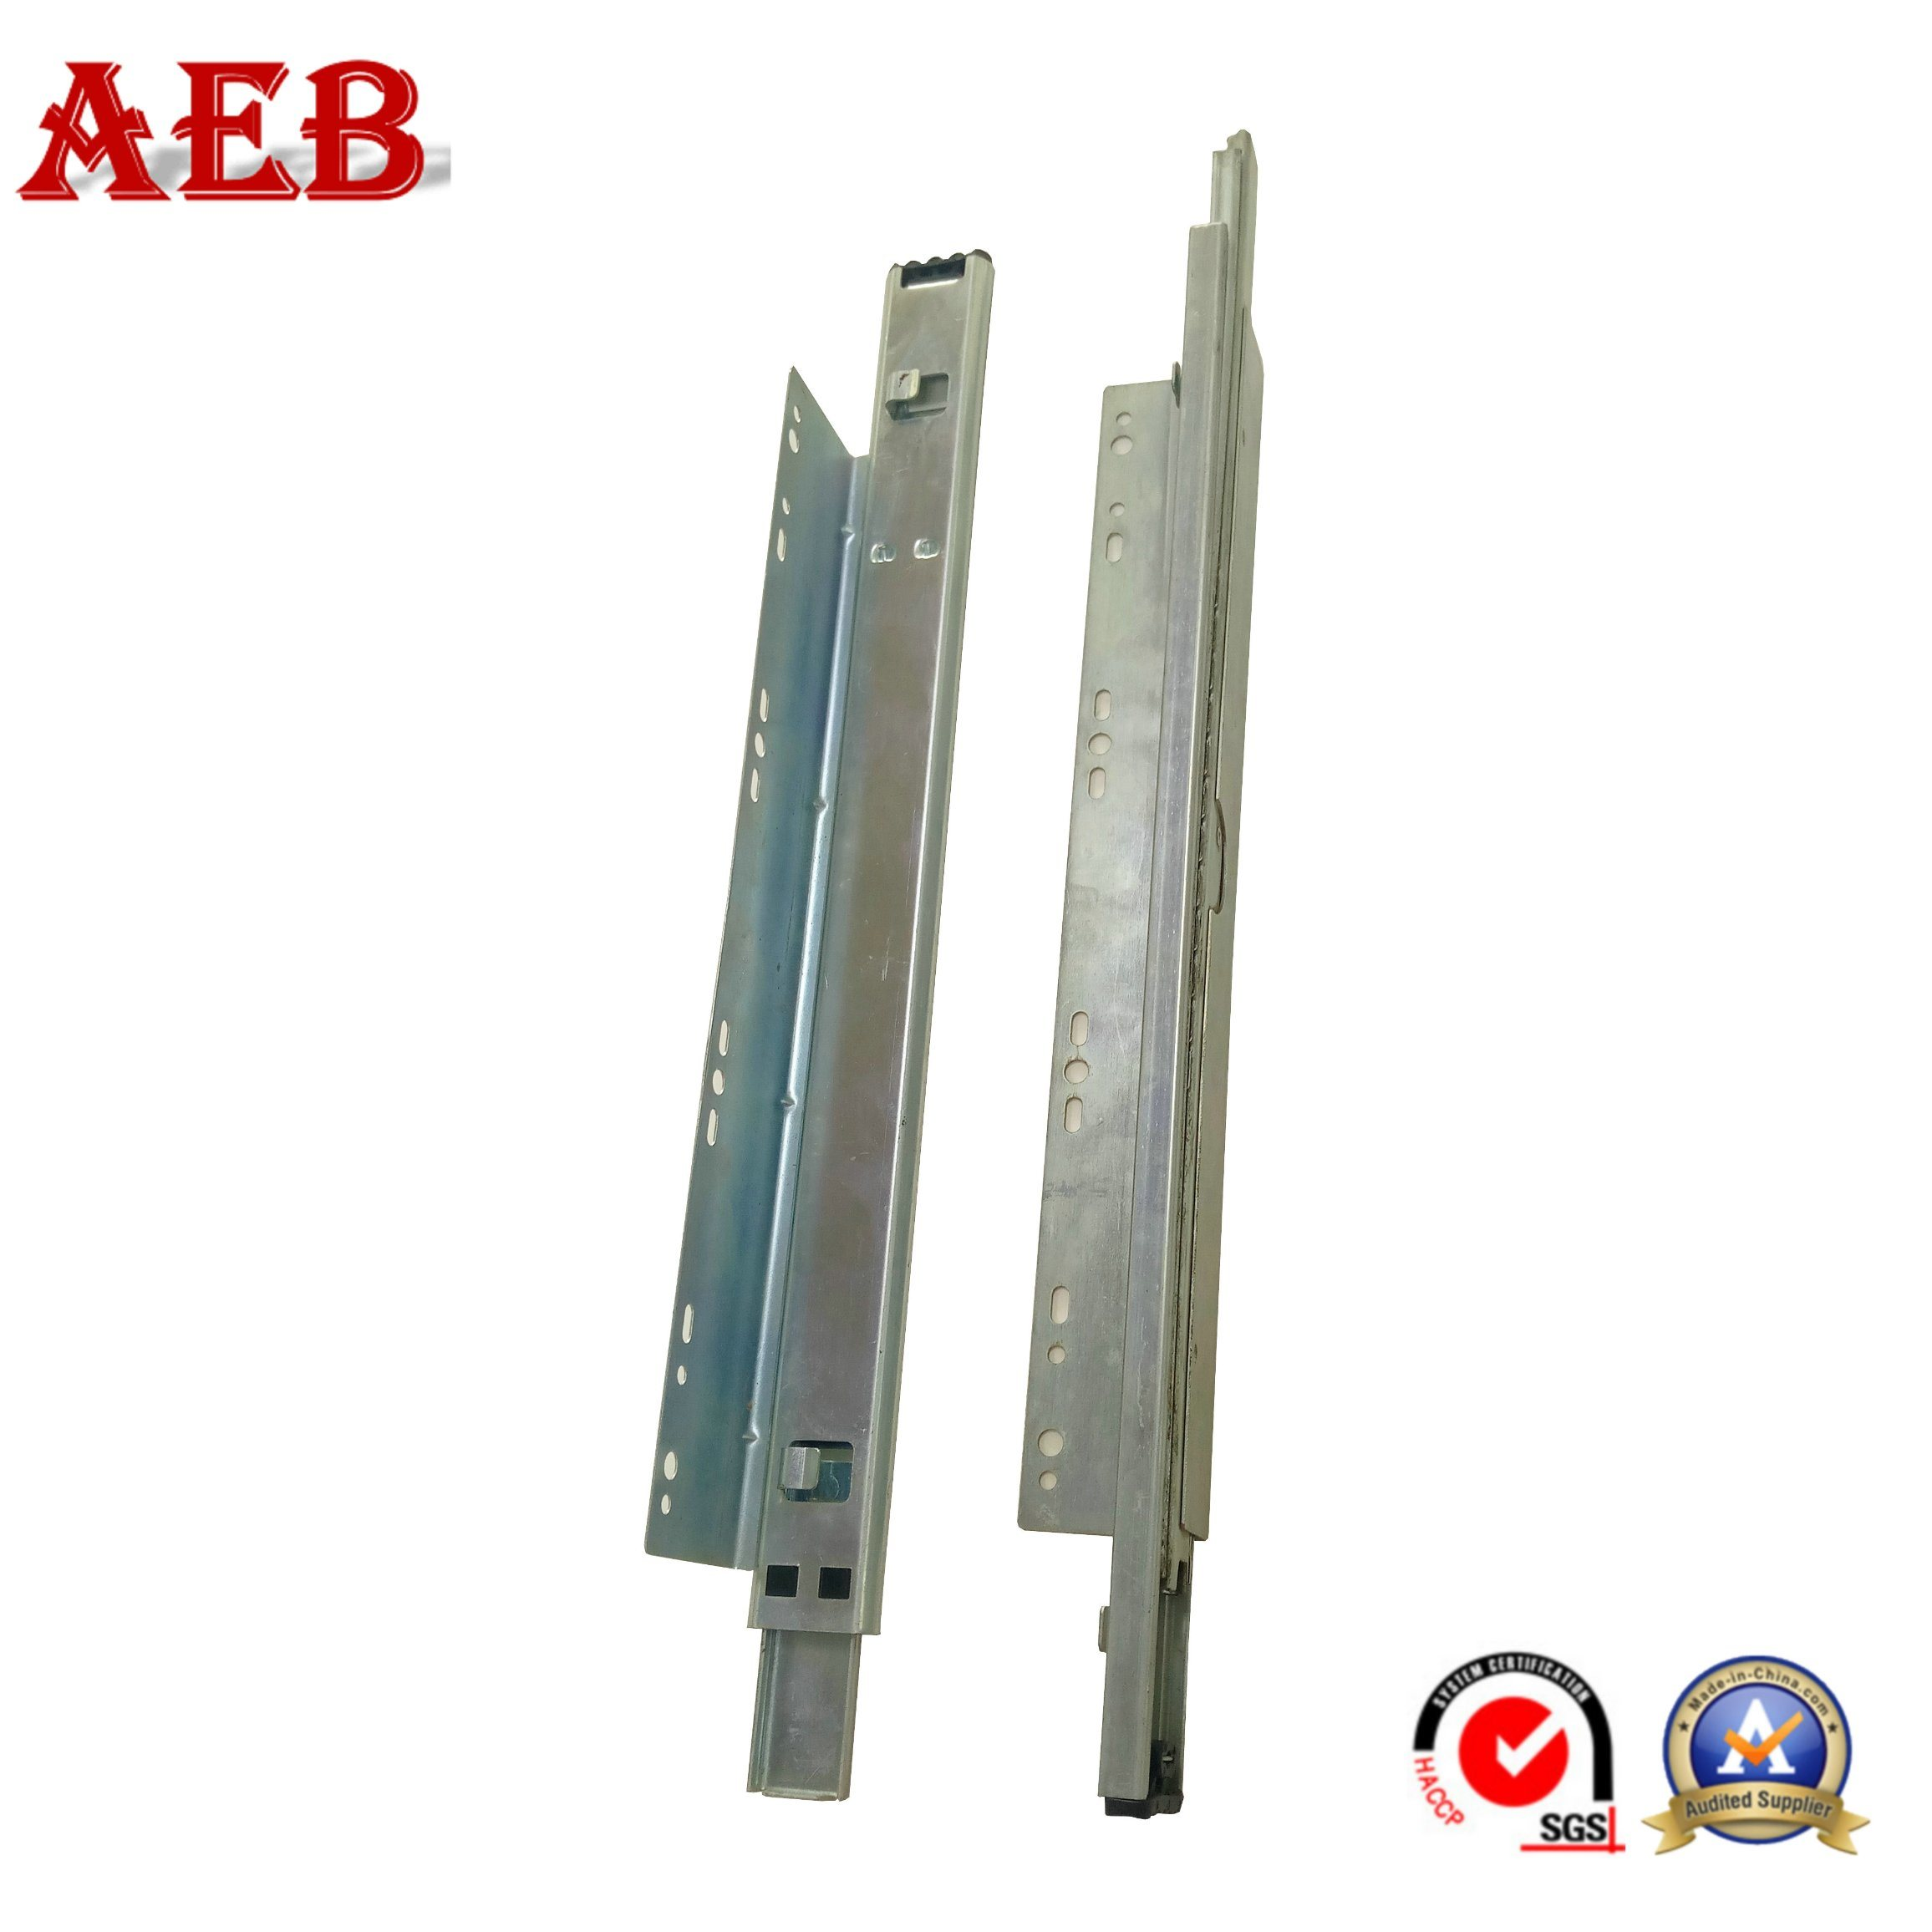 drawers ujbxfkqjolhk slides drawer product boxes bearing rail tool china telescopic guide linear inch ball hanging slide